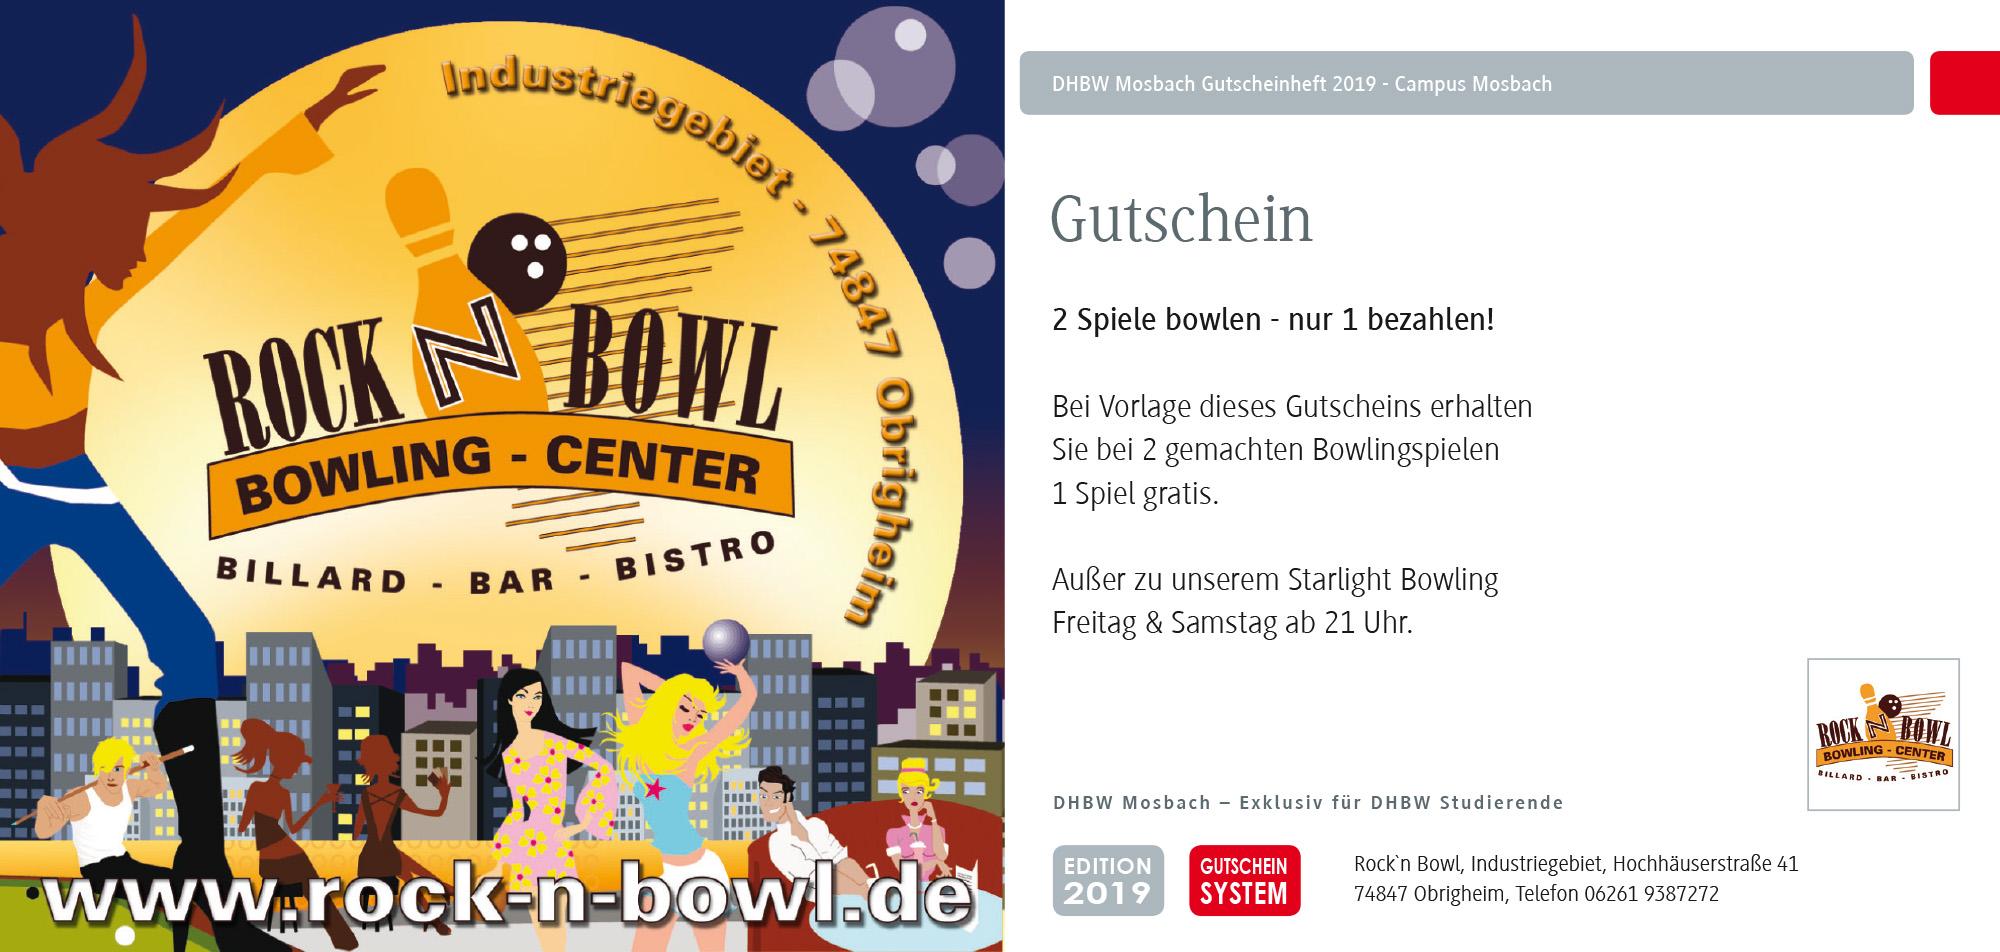 DHBW Mosbach Coupon Bowling